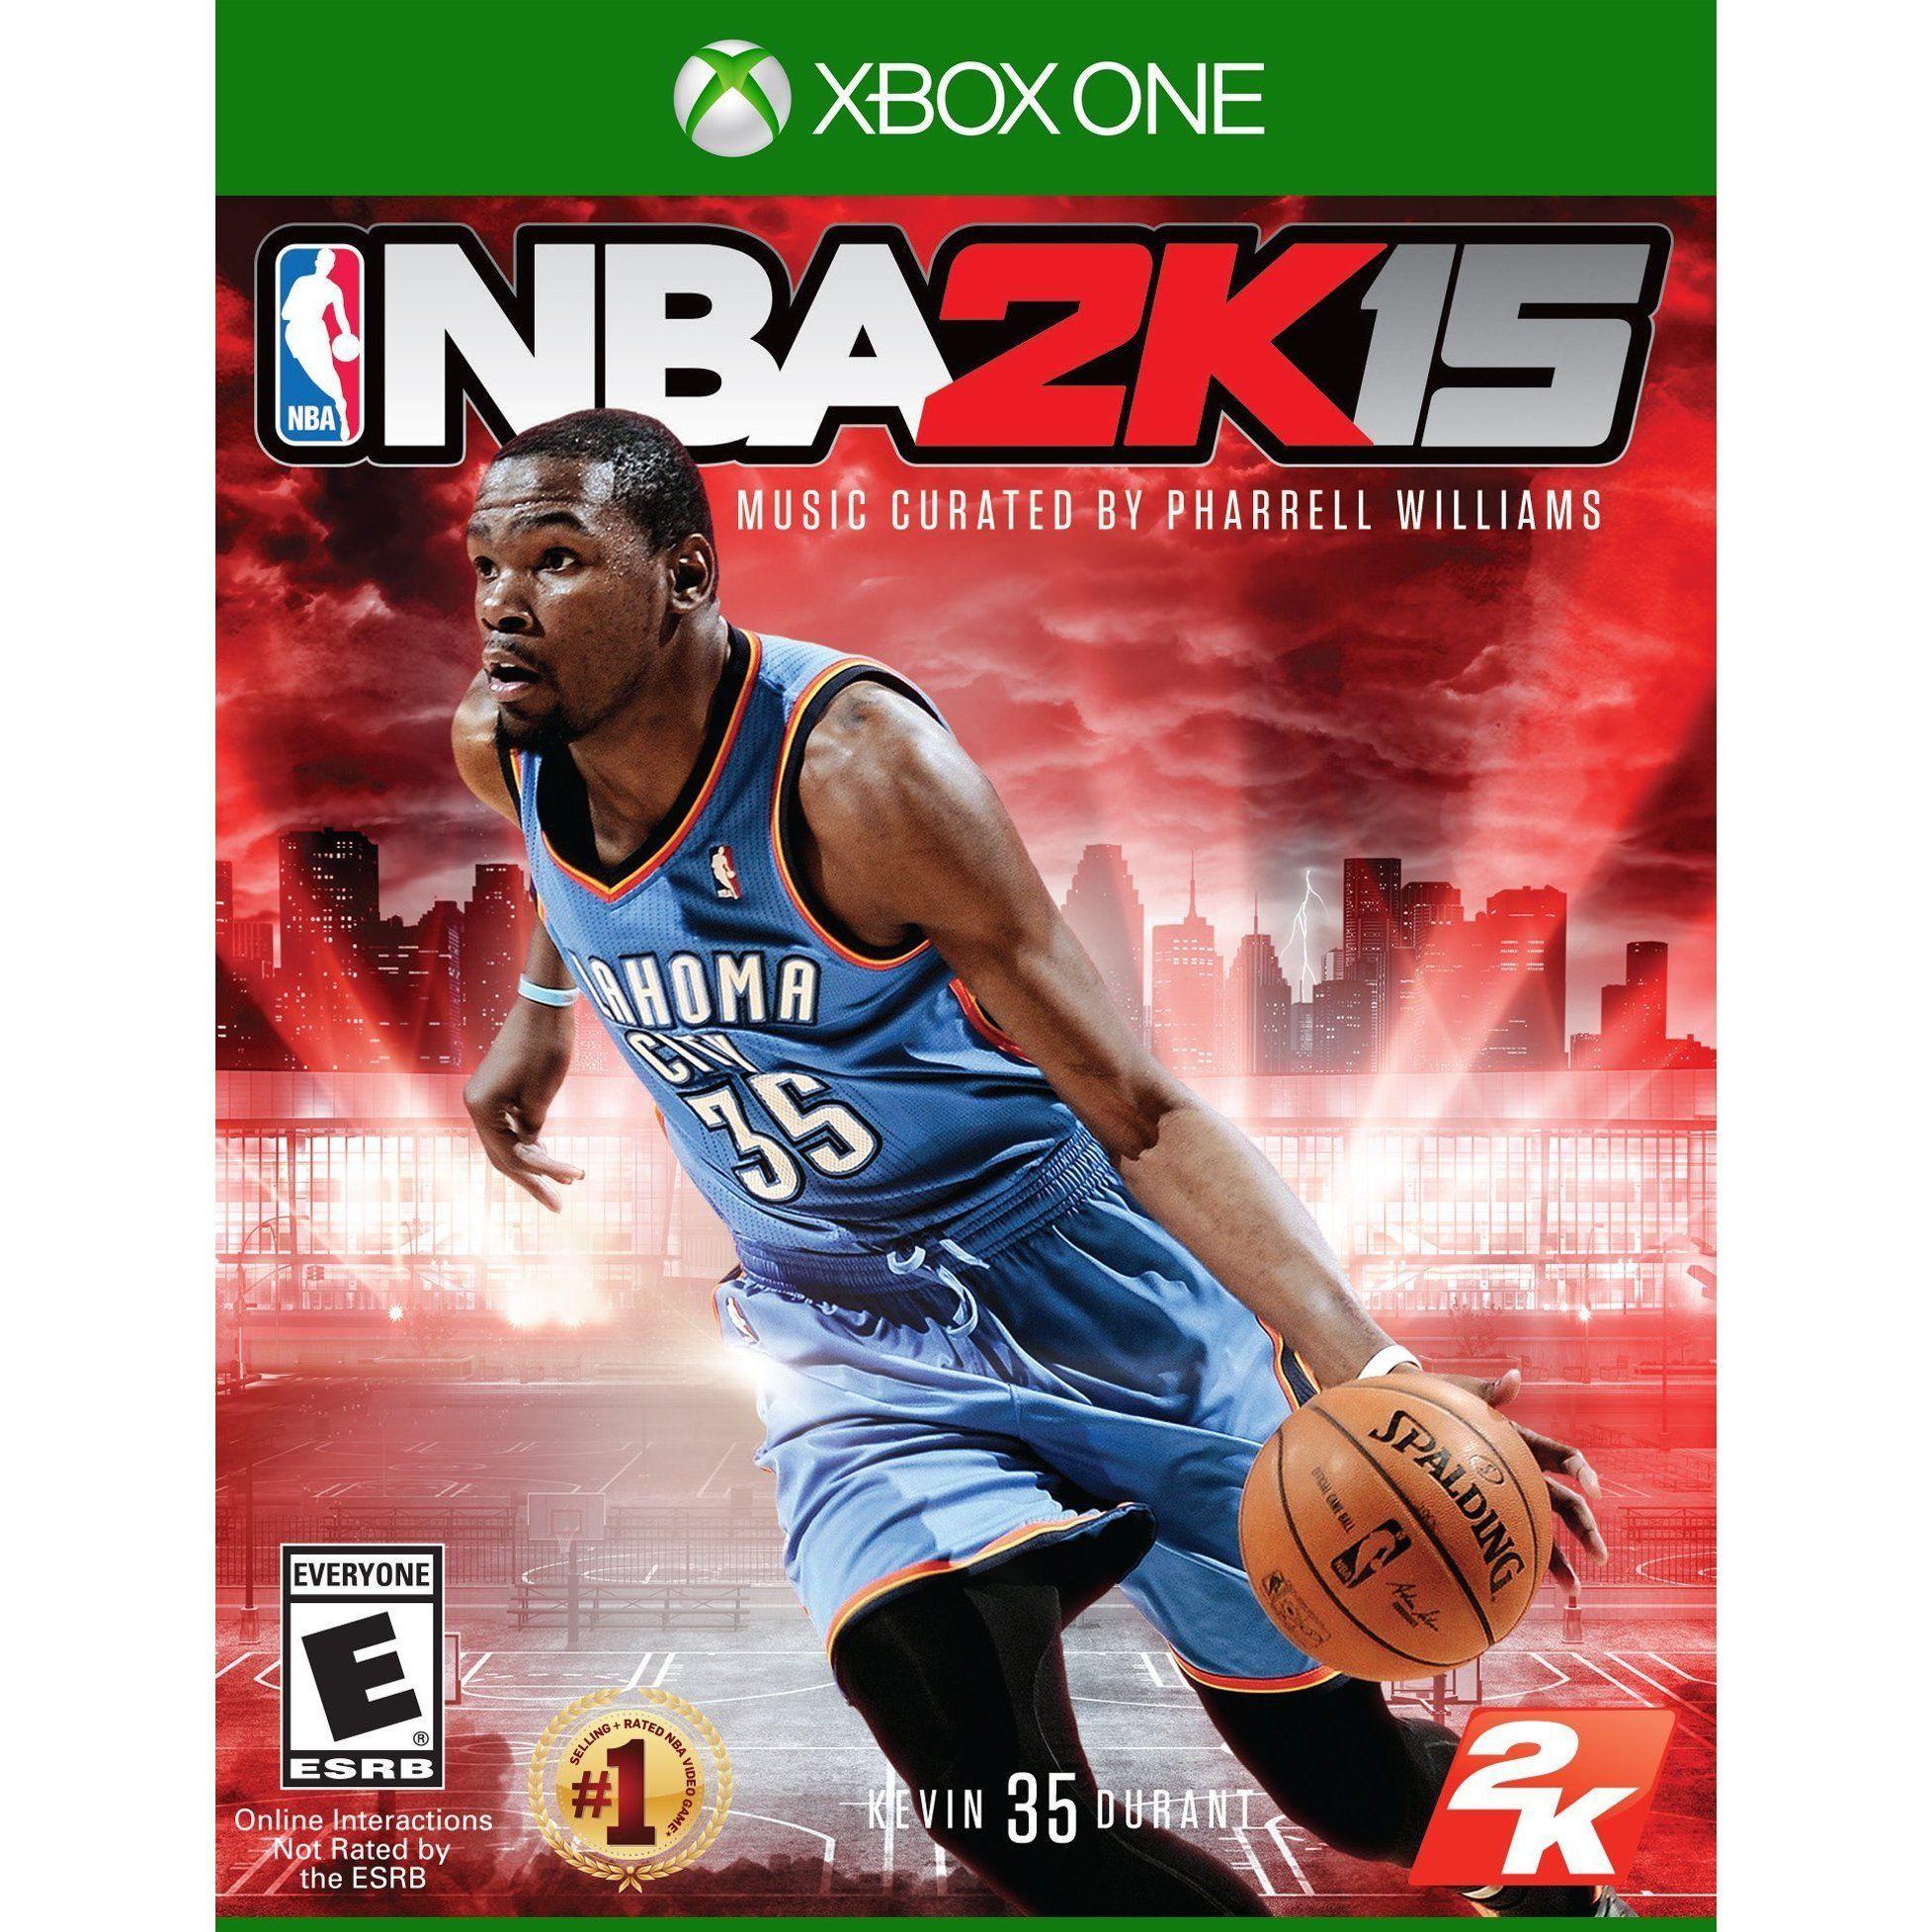 Take 2 Interactive Xbox One NBA 2K15 Ps4 games, Xbox